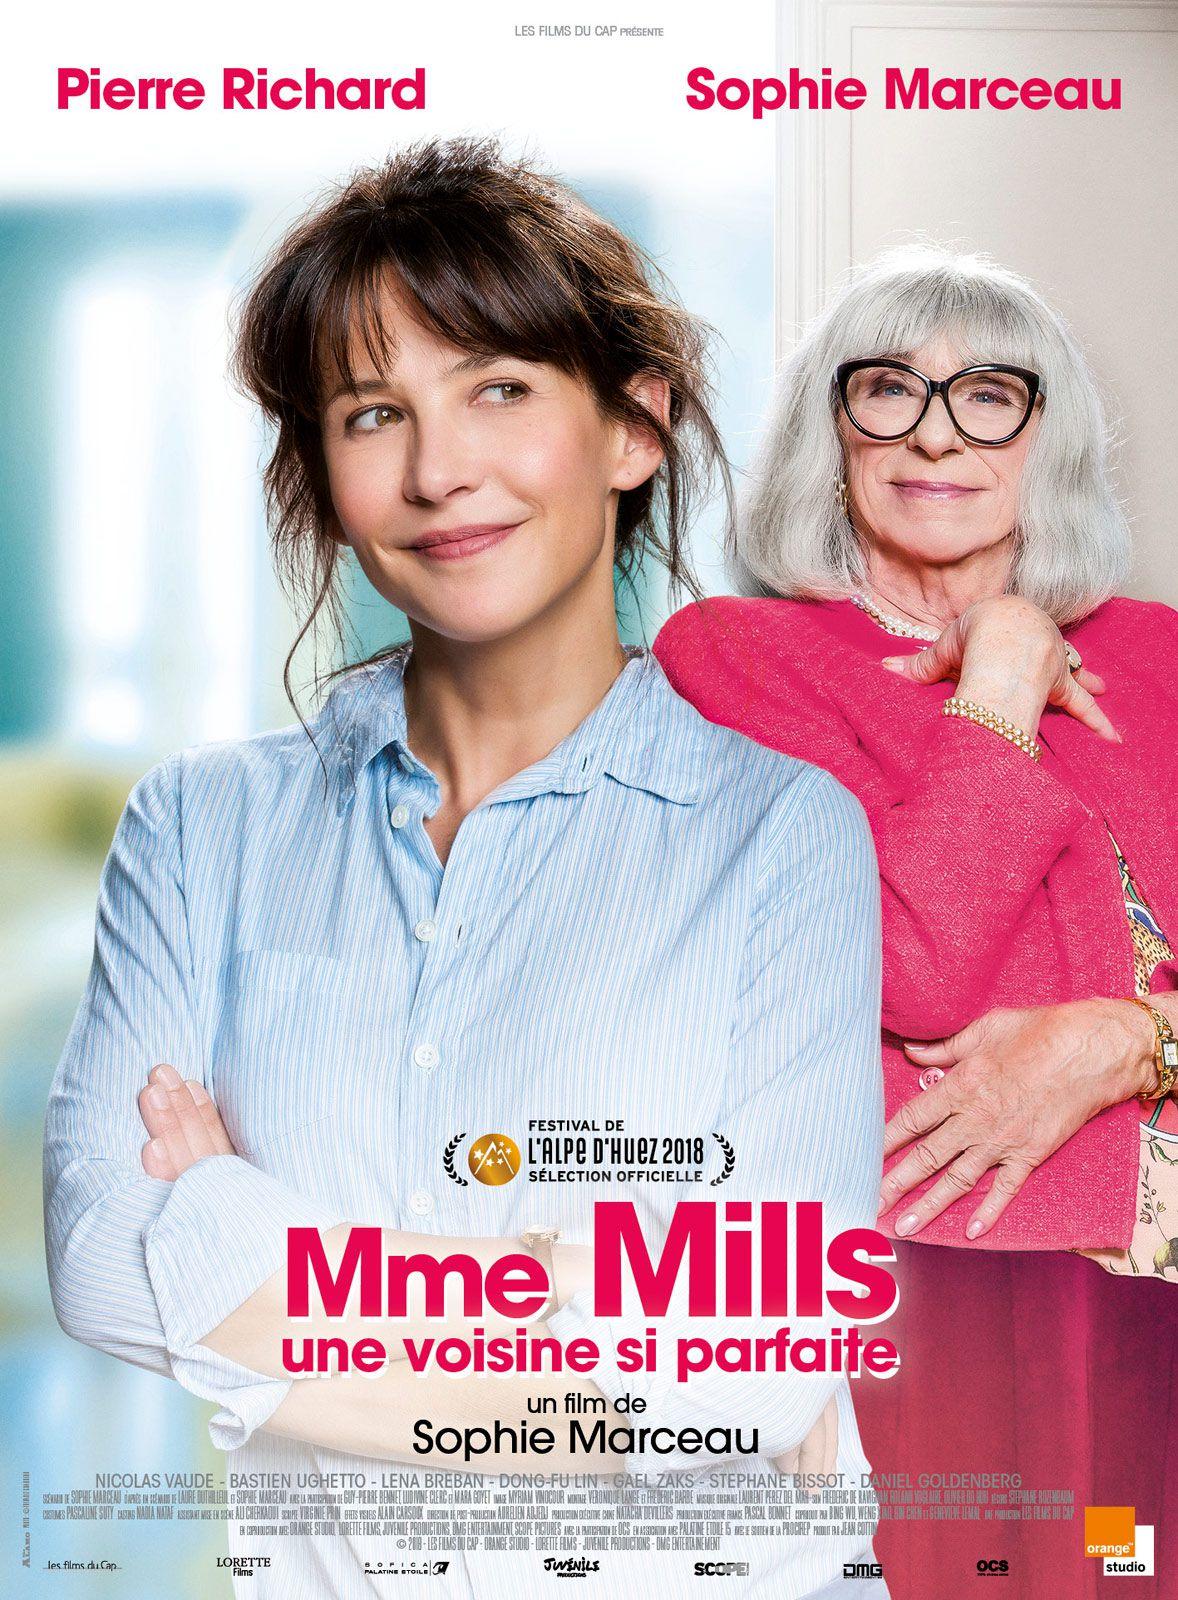 Mme Mills, une voisine si parfaite - Film (2018)